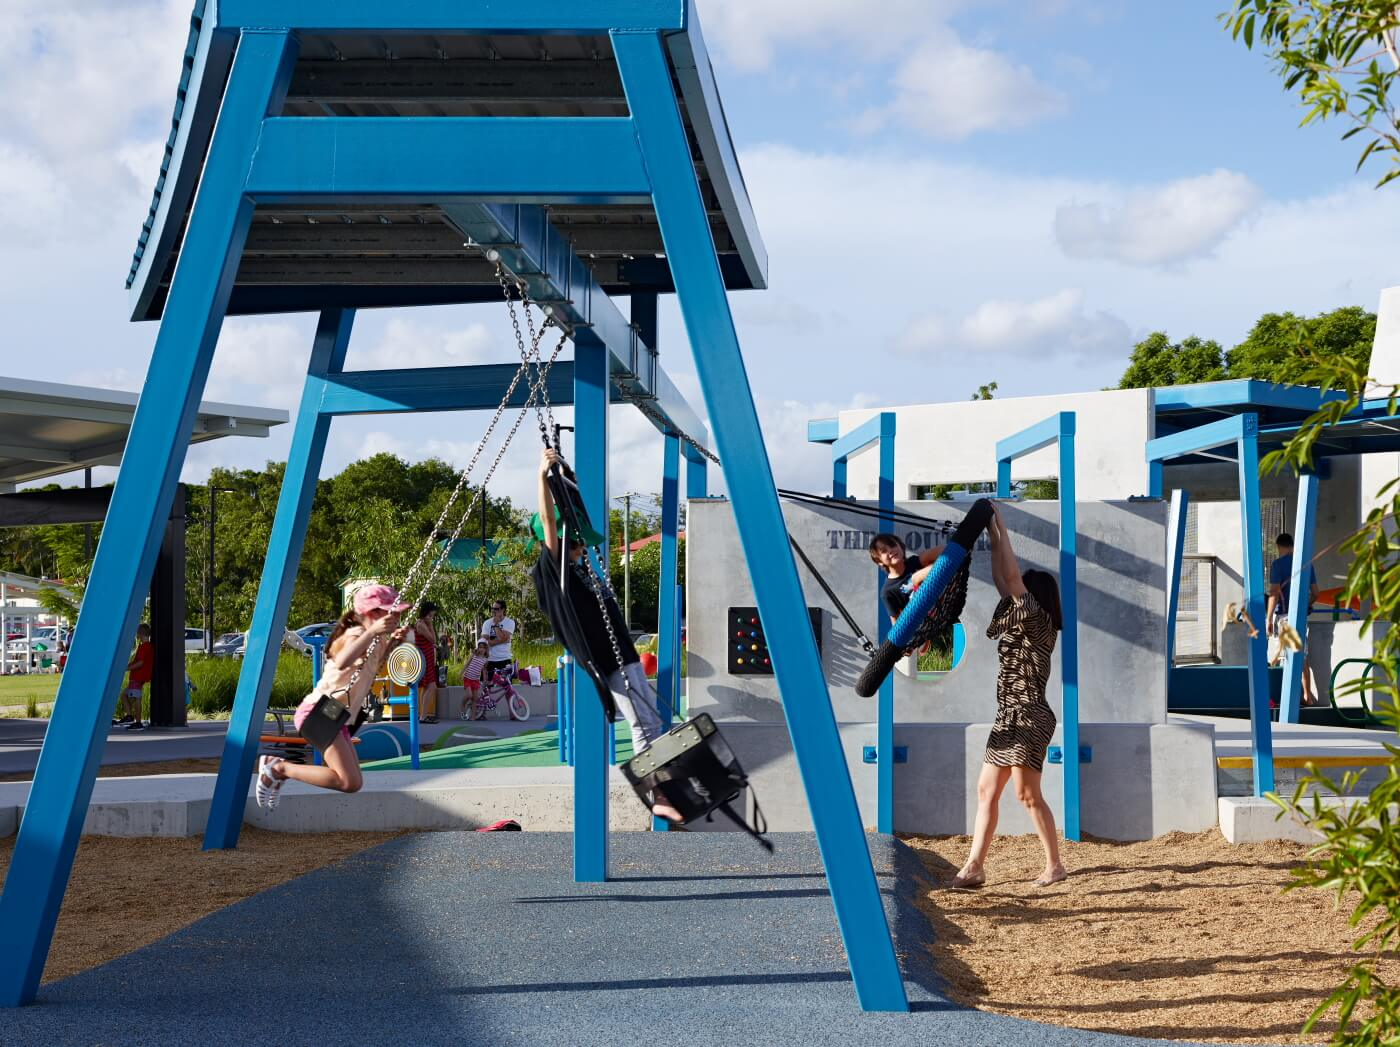 Frew-park-arena-playground-guymer-bailey-08.JPG